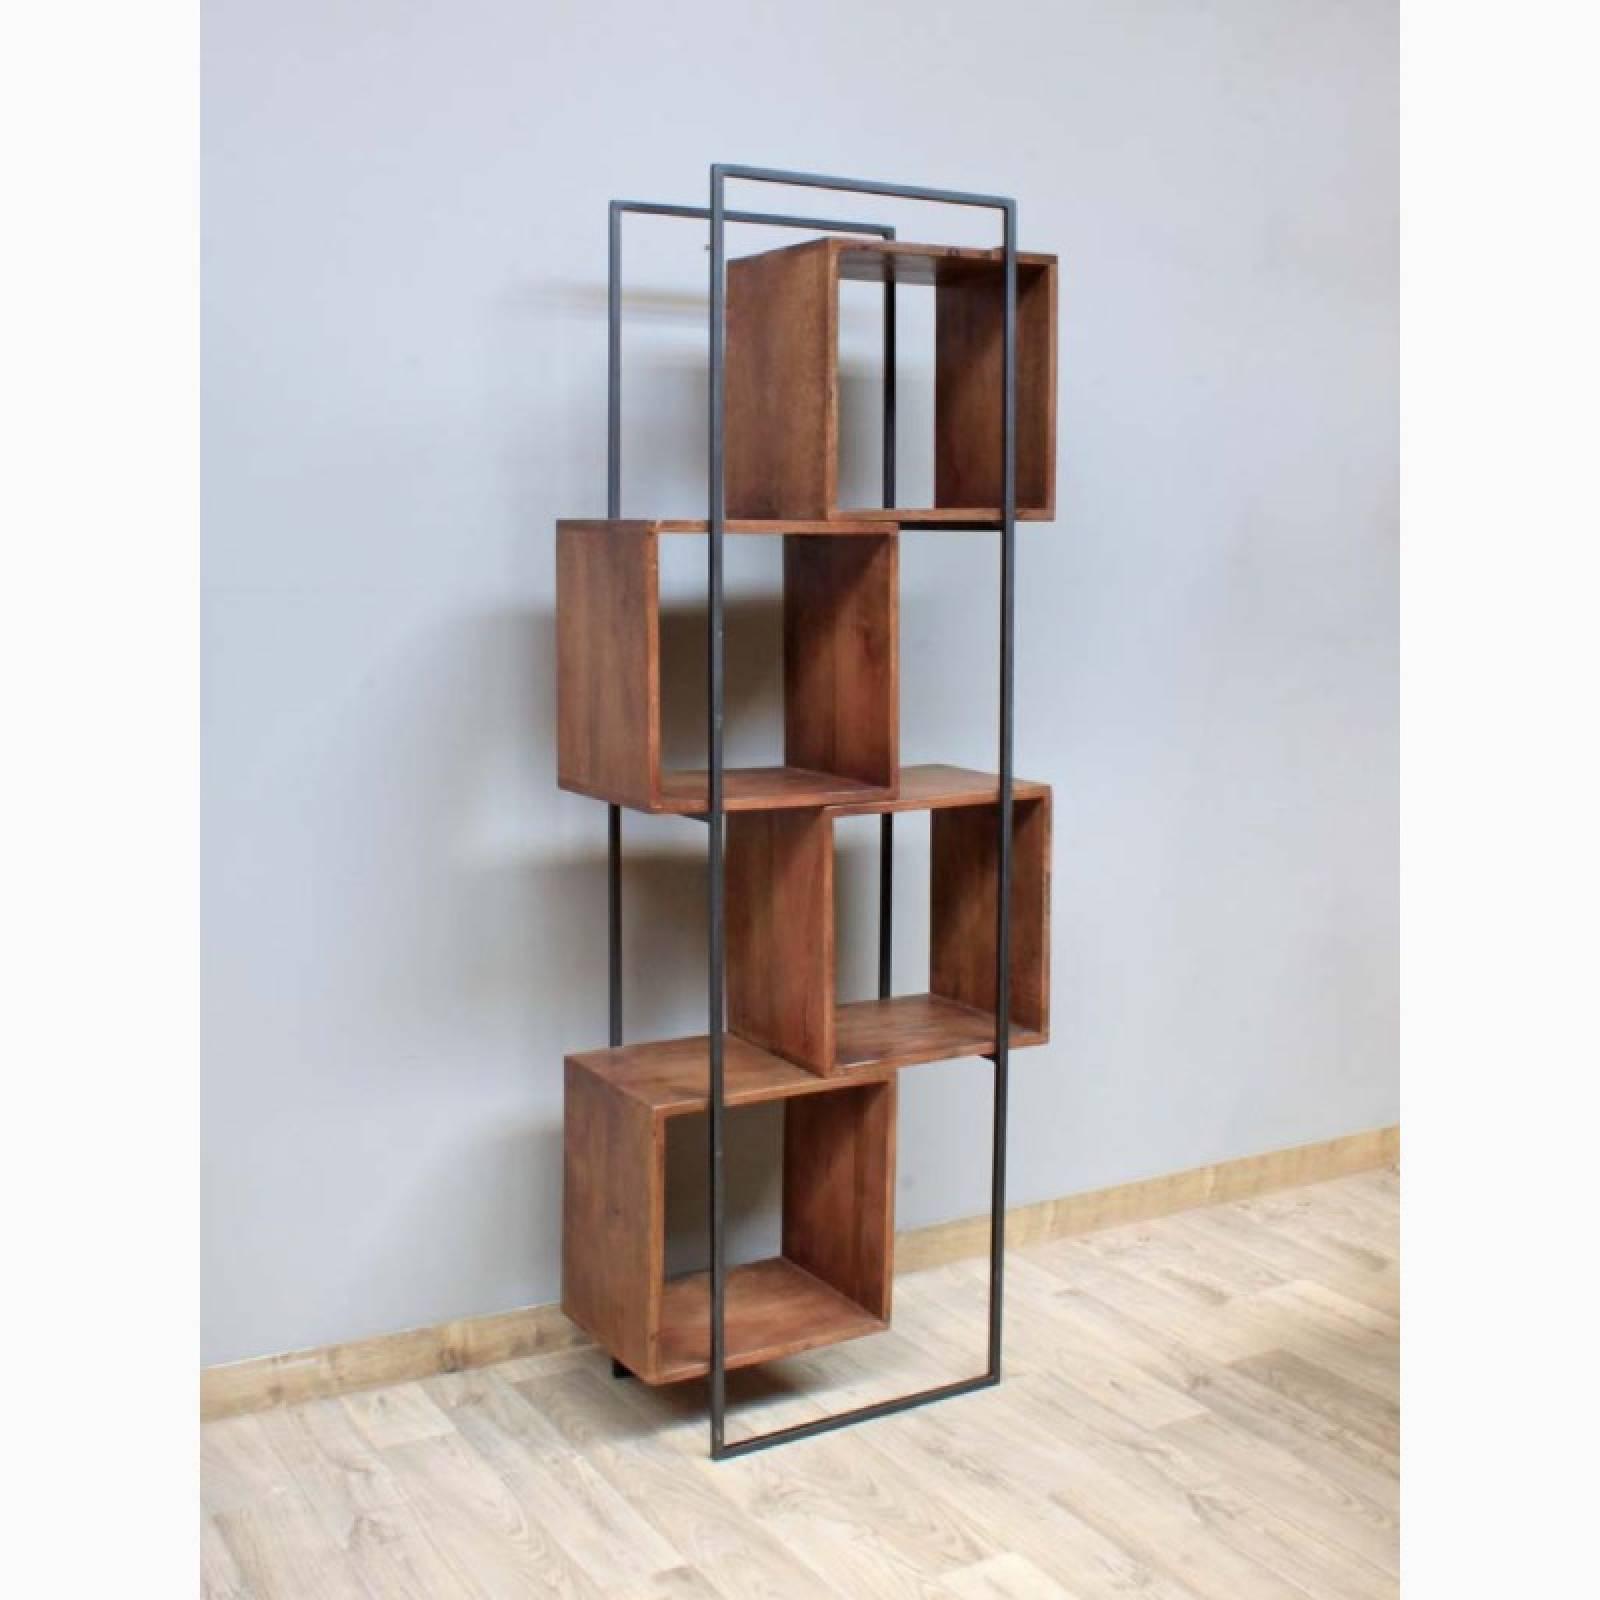 Wood & Metal Offset Quadrant Tall Shelving Unit thumbnails